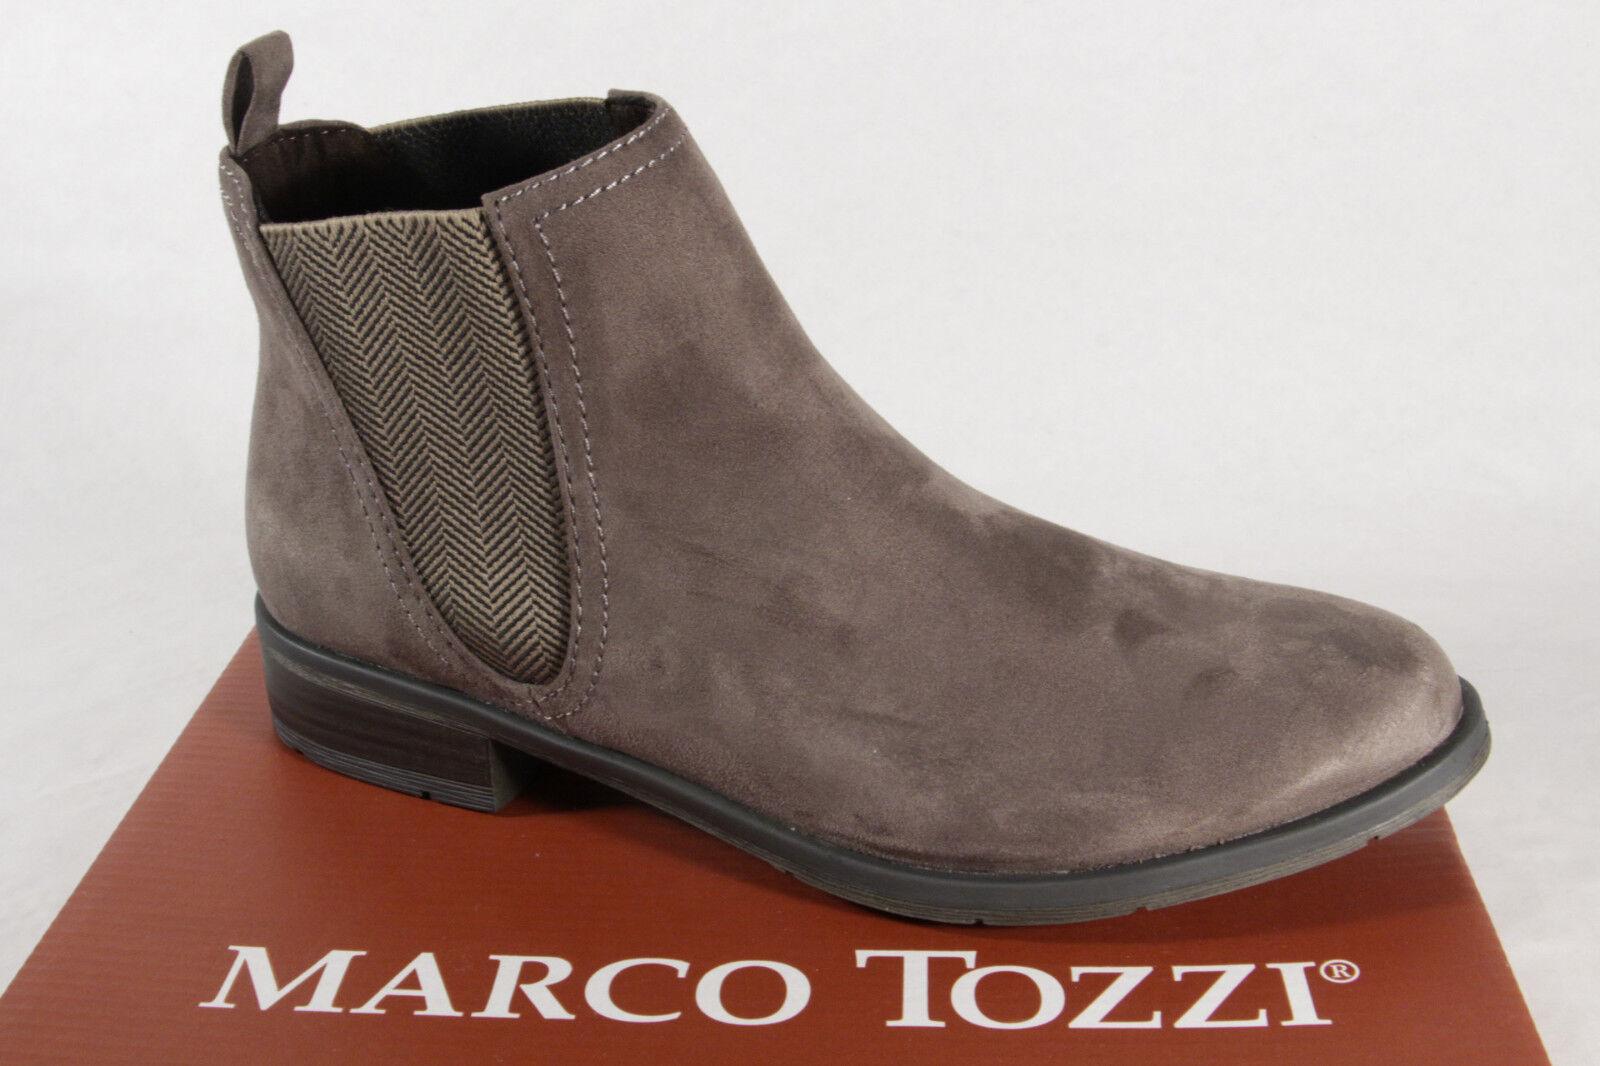 Marco Tozzi 25321 Stivali Donna, Stivaletti, stivali Pepe Pepe Pepe Nuovo 49797a